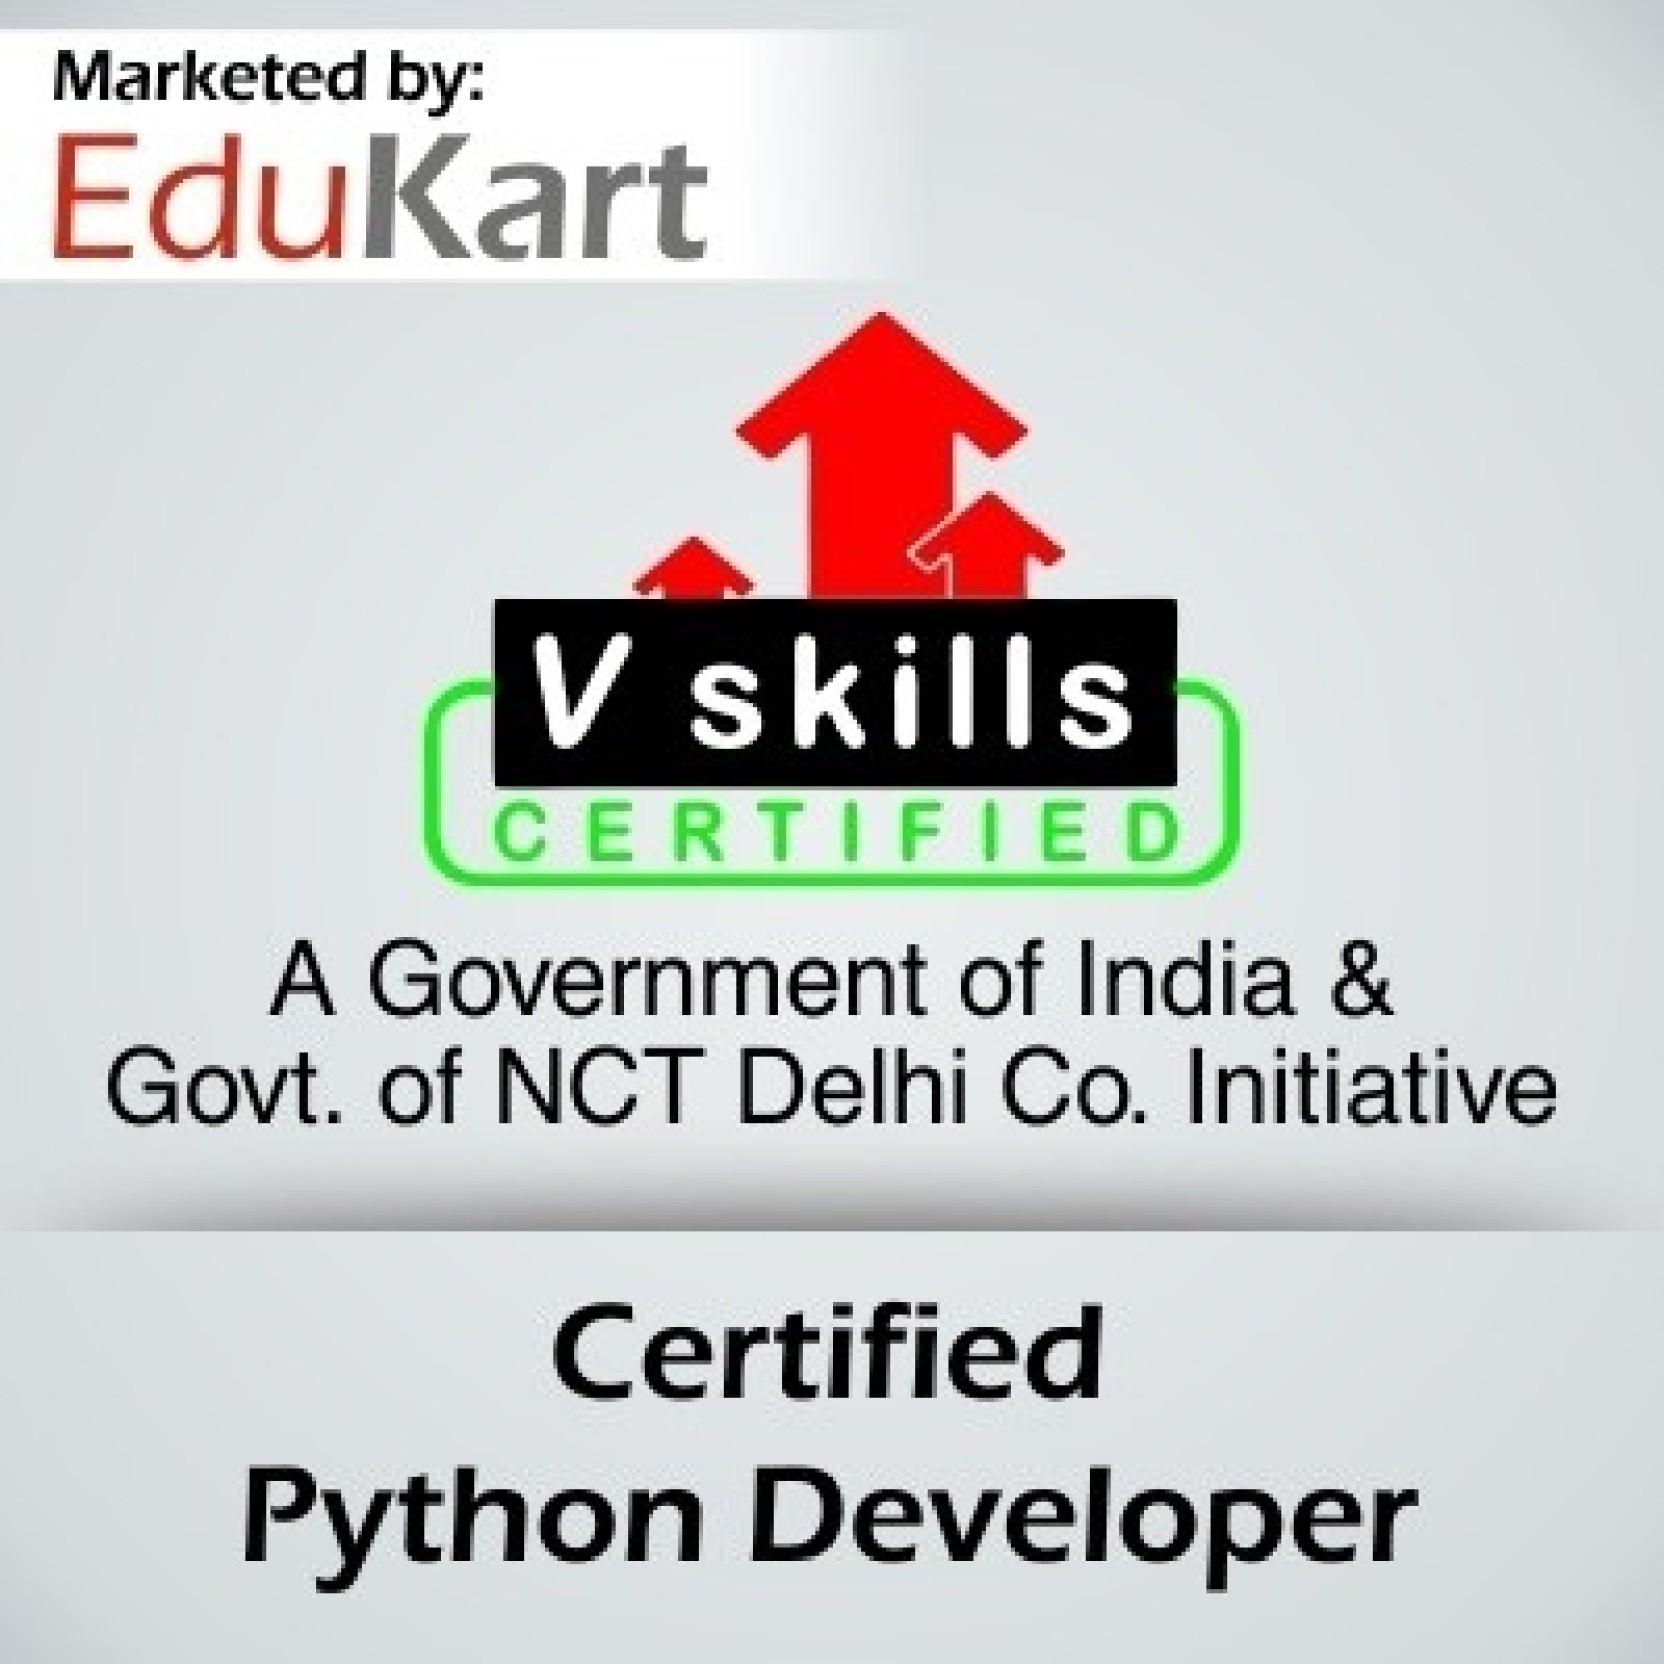 Vskills certified python developer v skills certified vskills certified python developer v skills certified certification course share 1betcityfo Choice Image